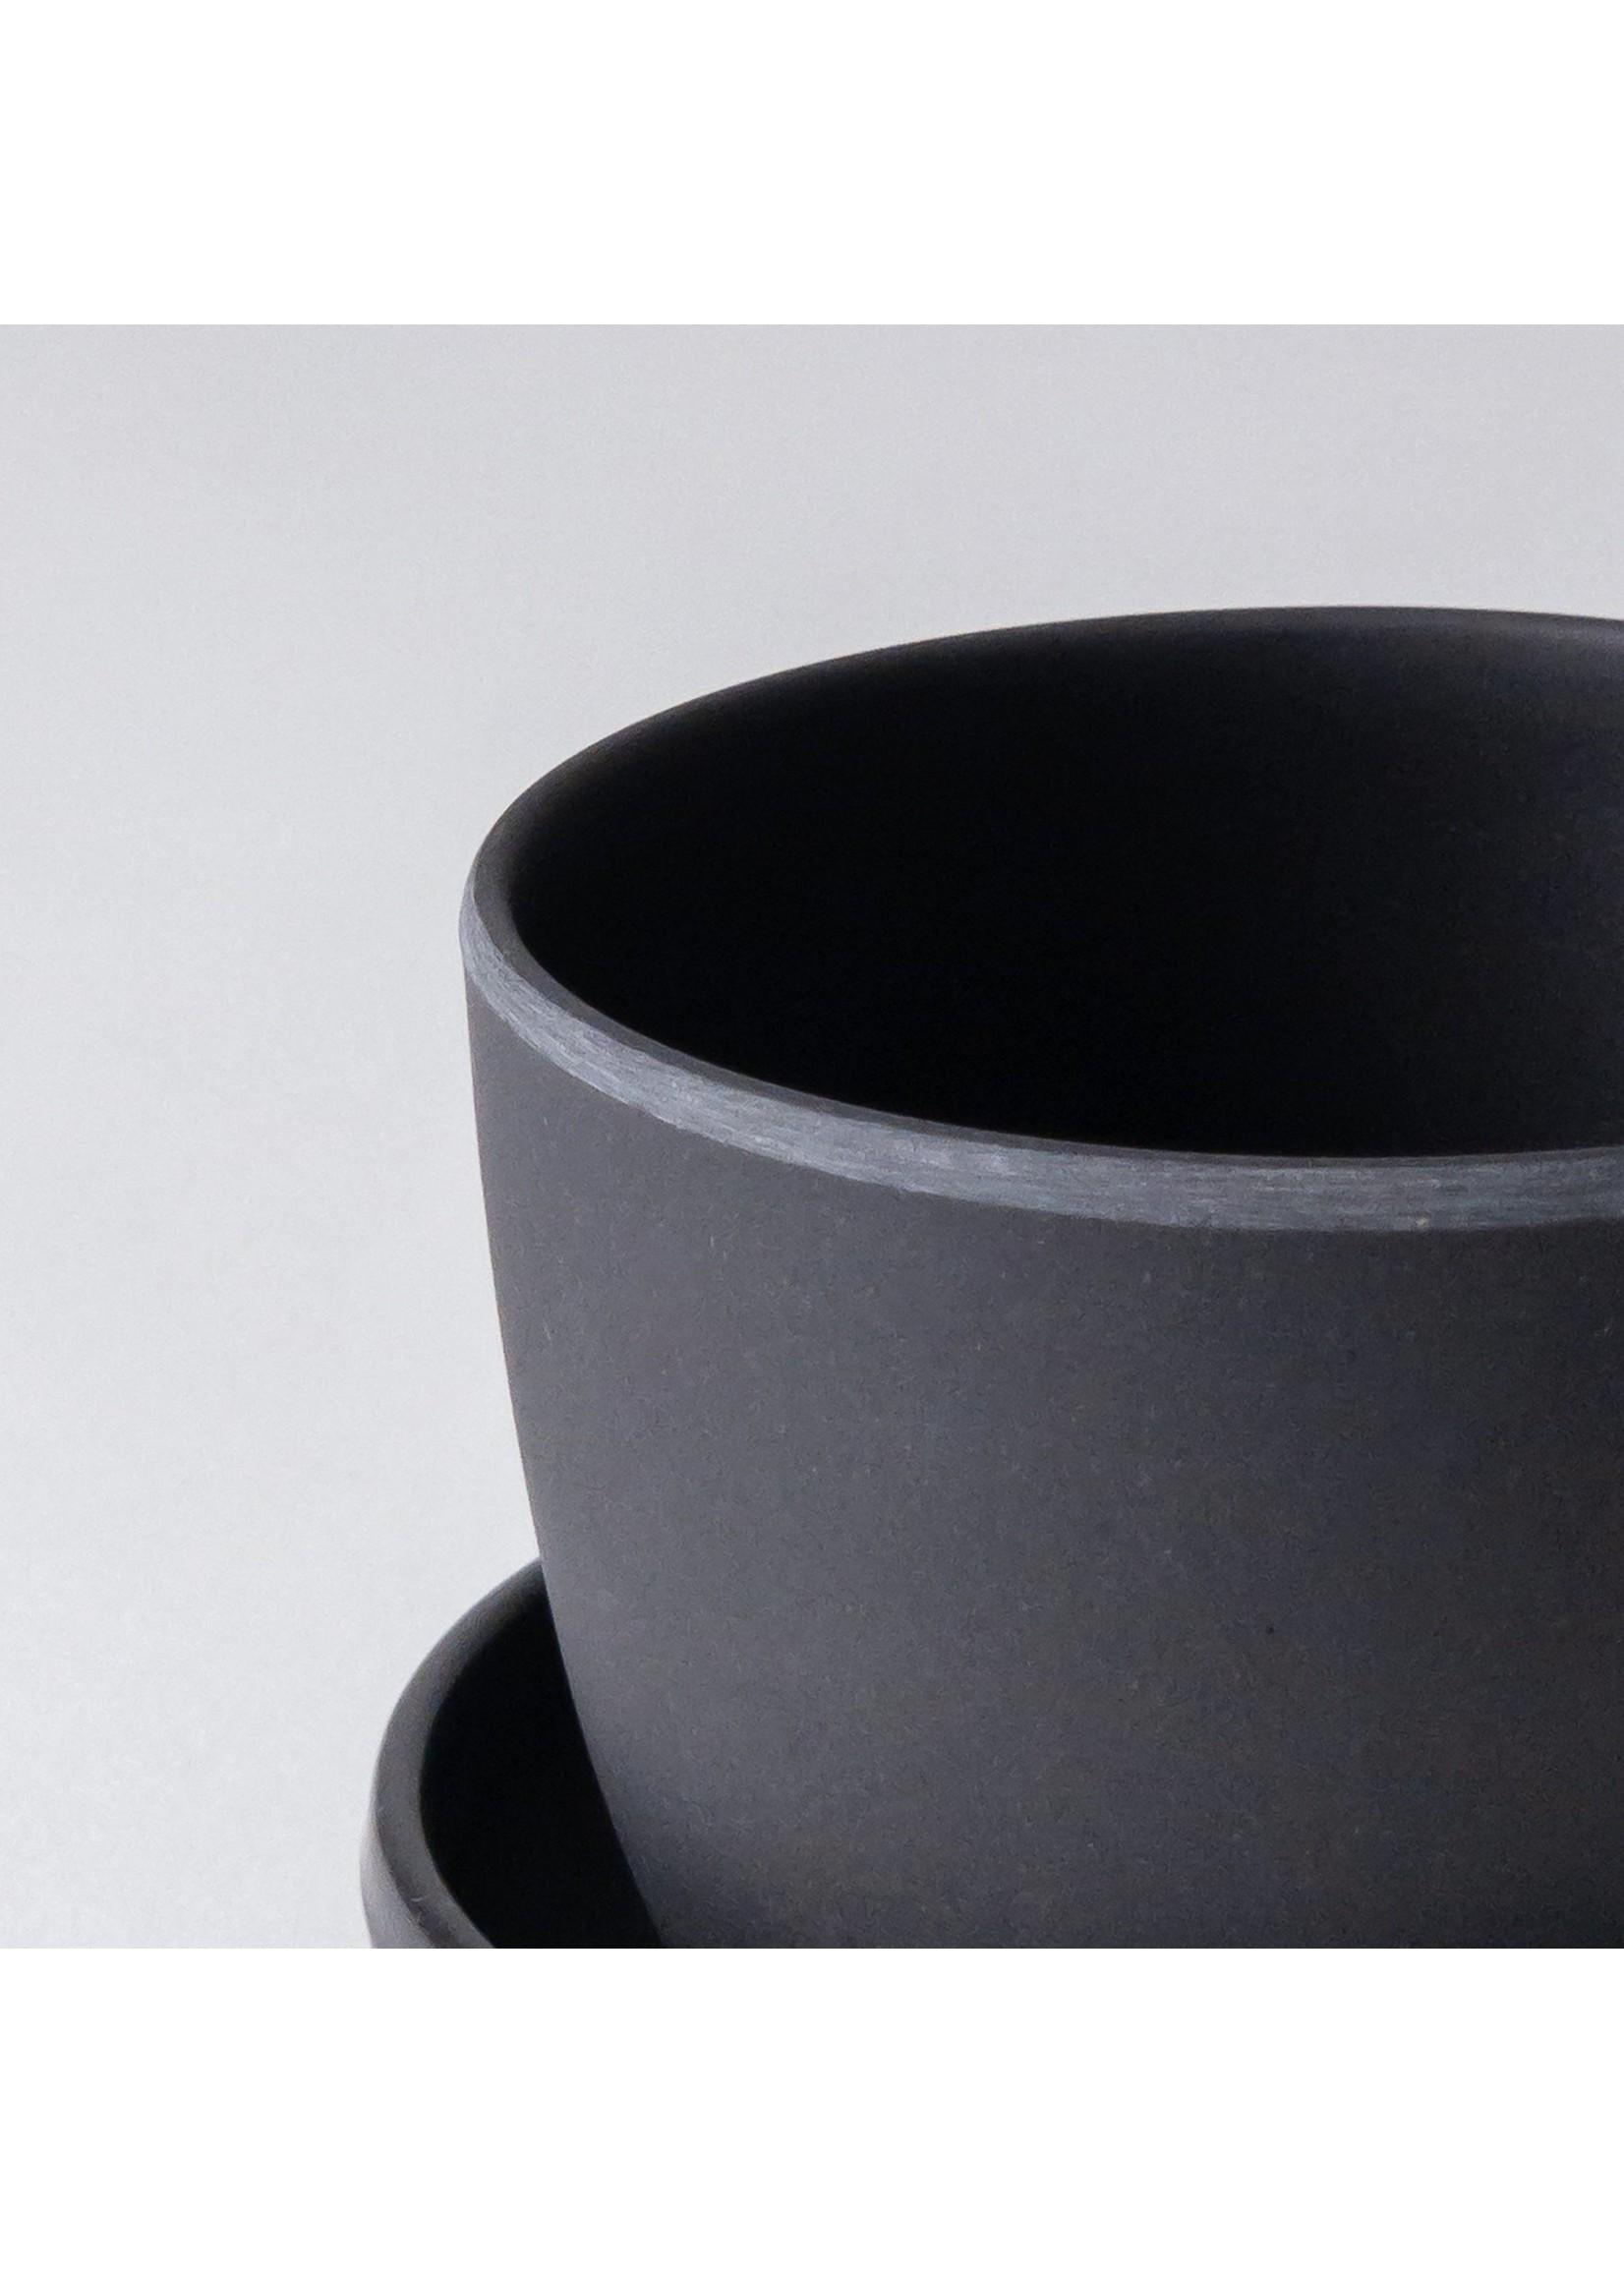 Kanso Designs Bamboo Fibre Mini Planter Black